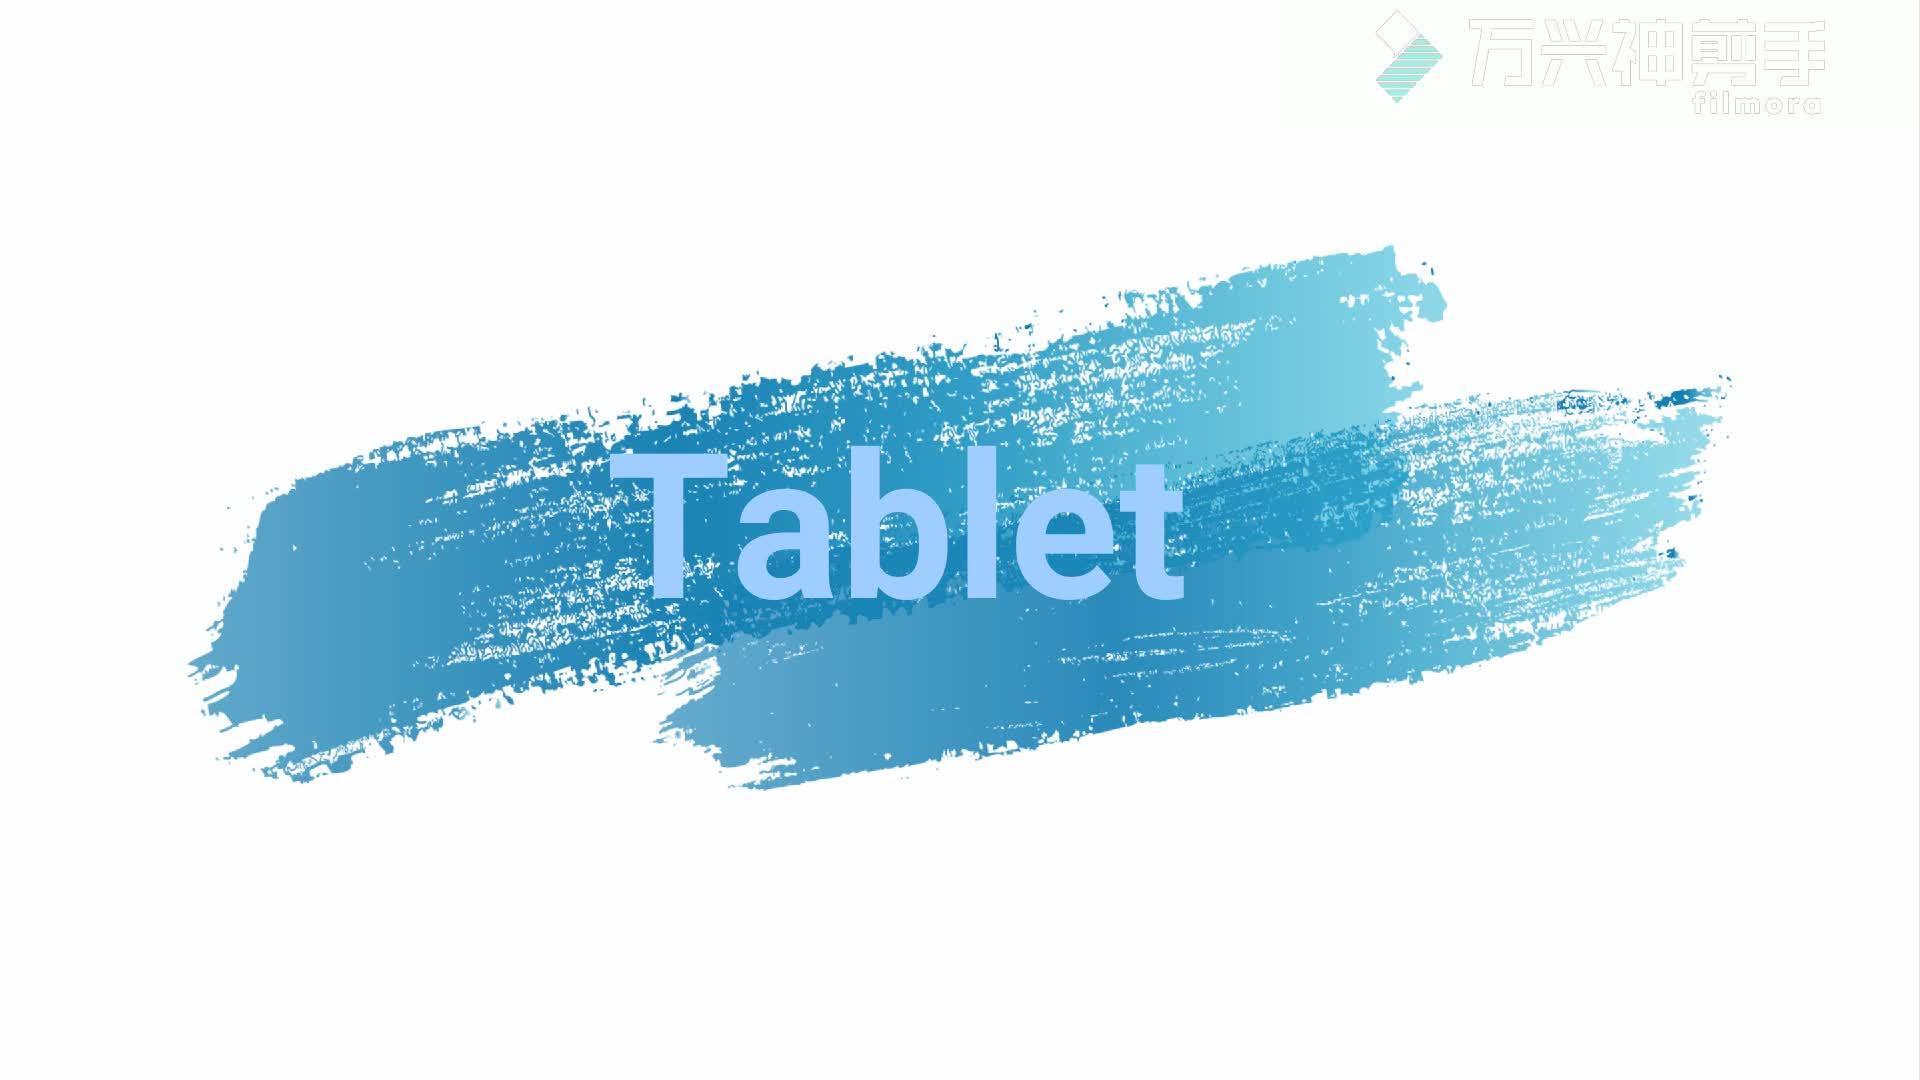 medical tablet Albendazole 250mg veterinary medicine for cattle camel sheep